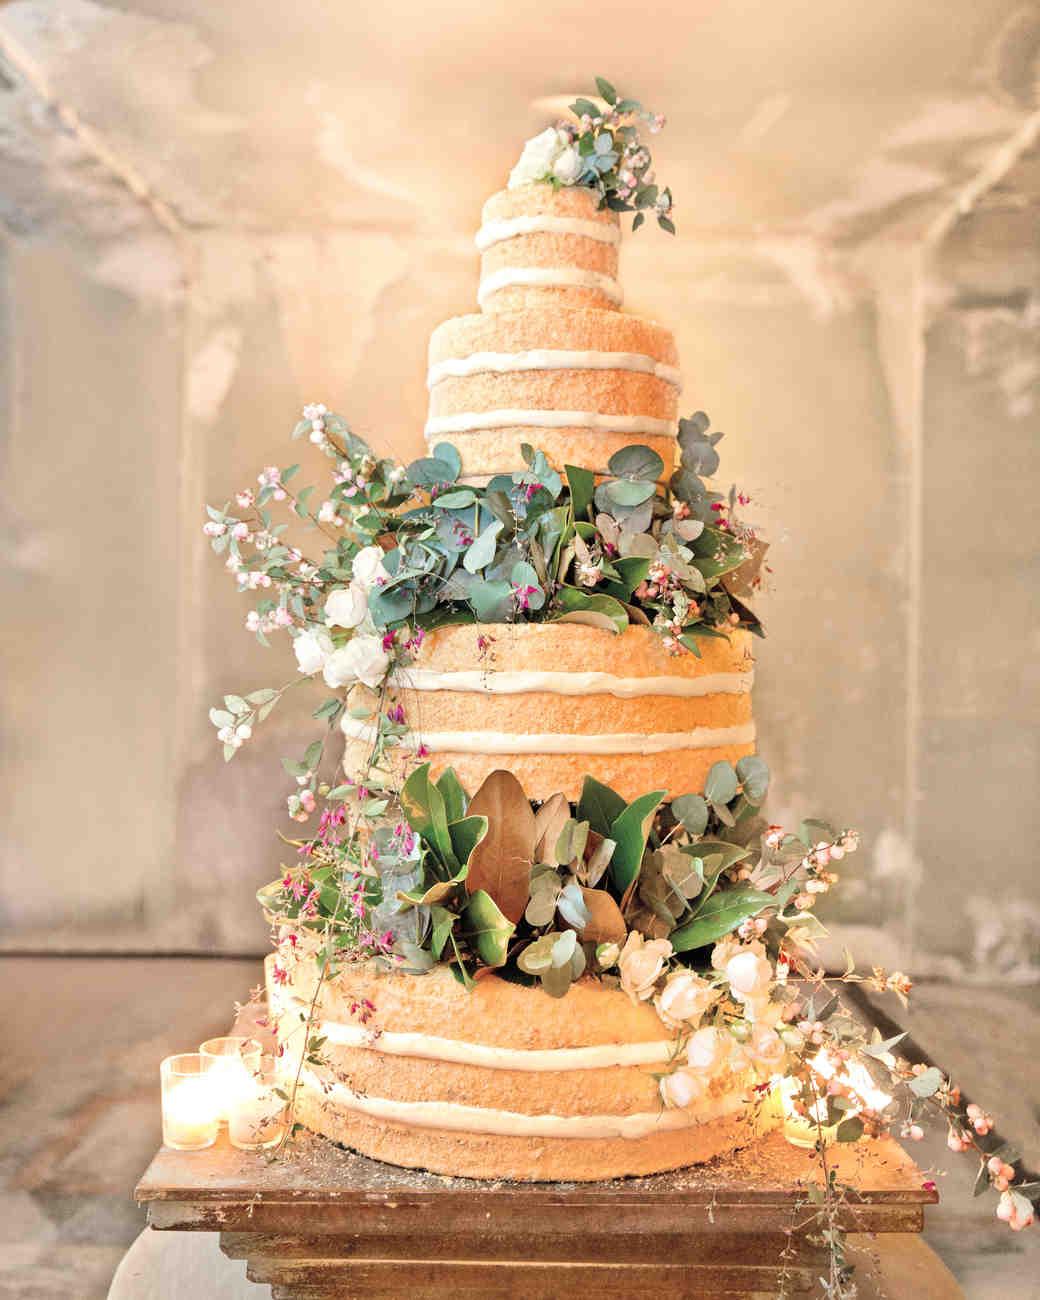 Make chocolate sponge wedding cake